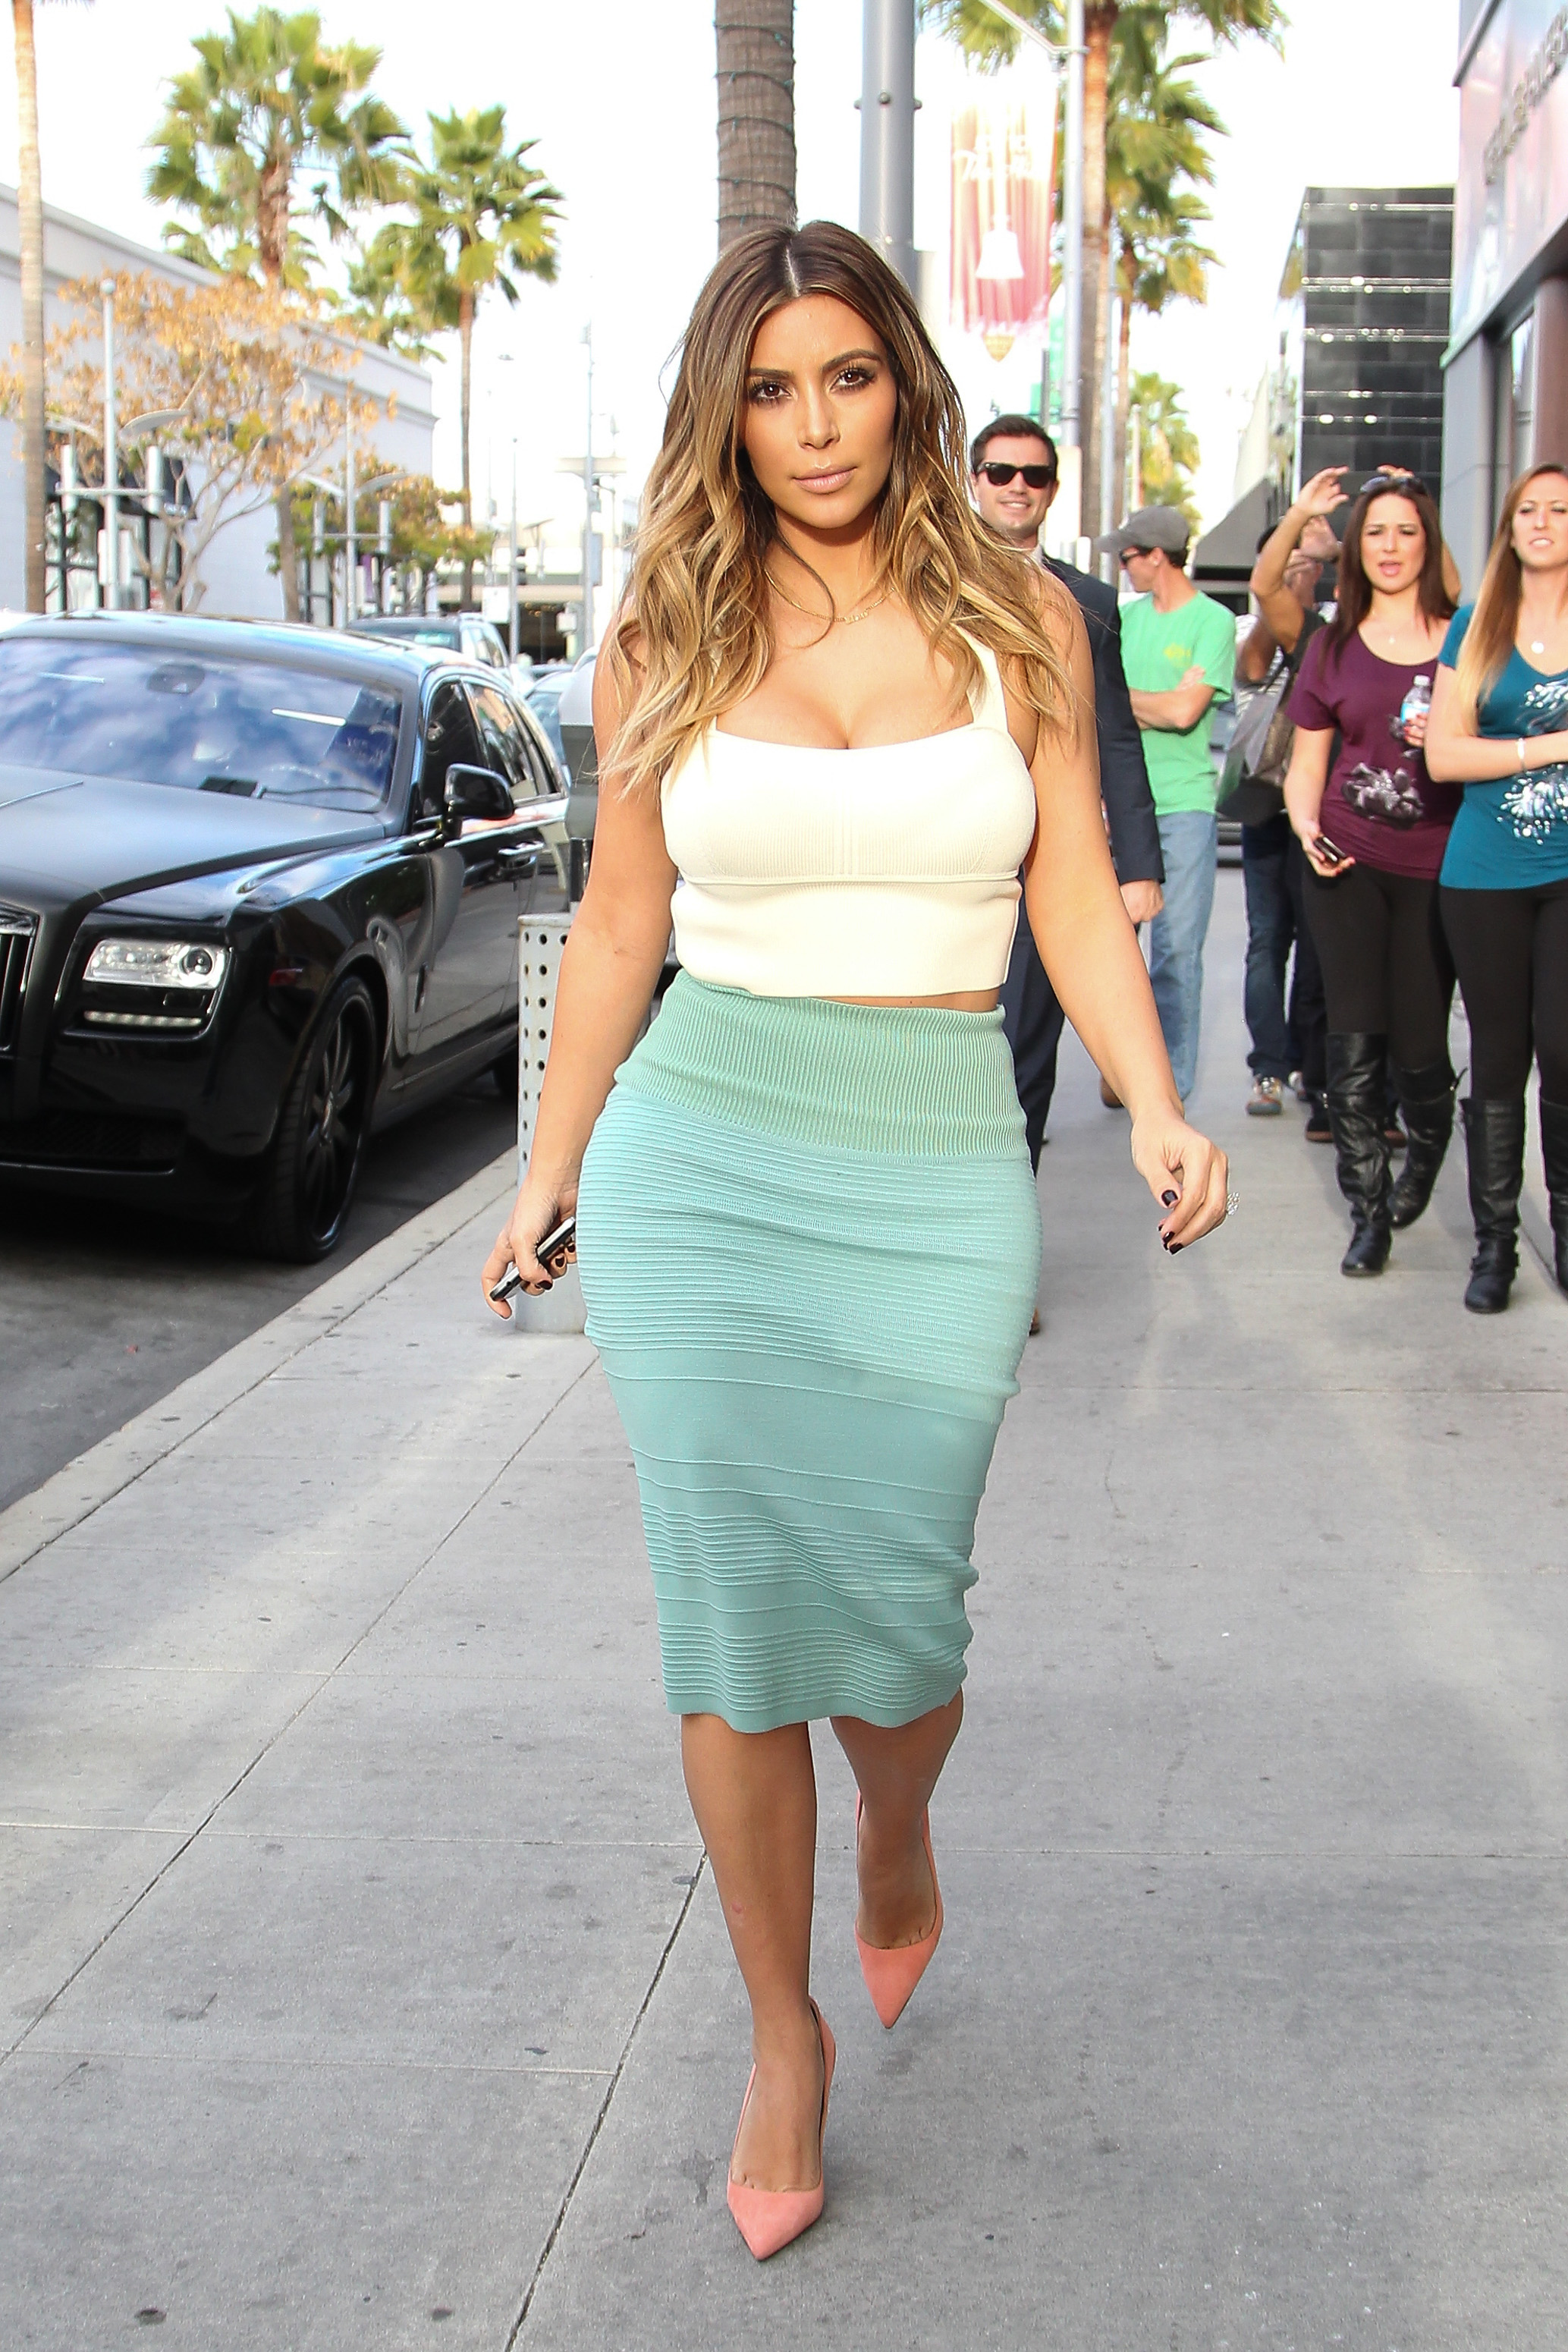 Celebrity Sightings In Los Angeles - January 06, 2014